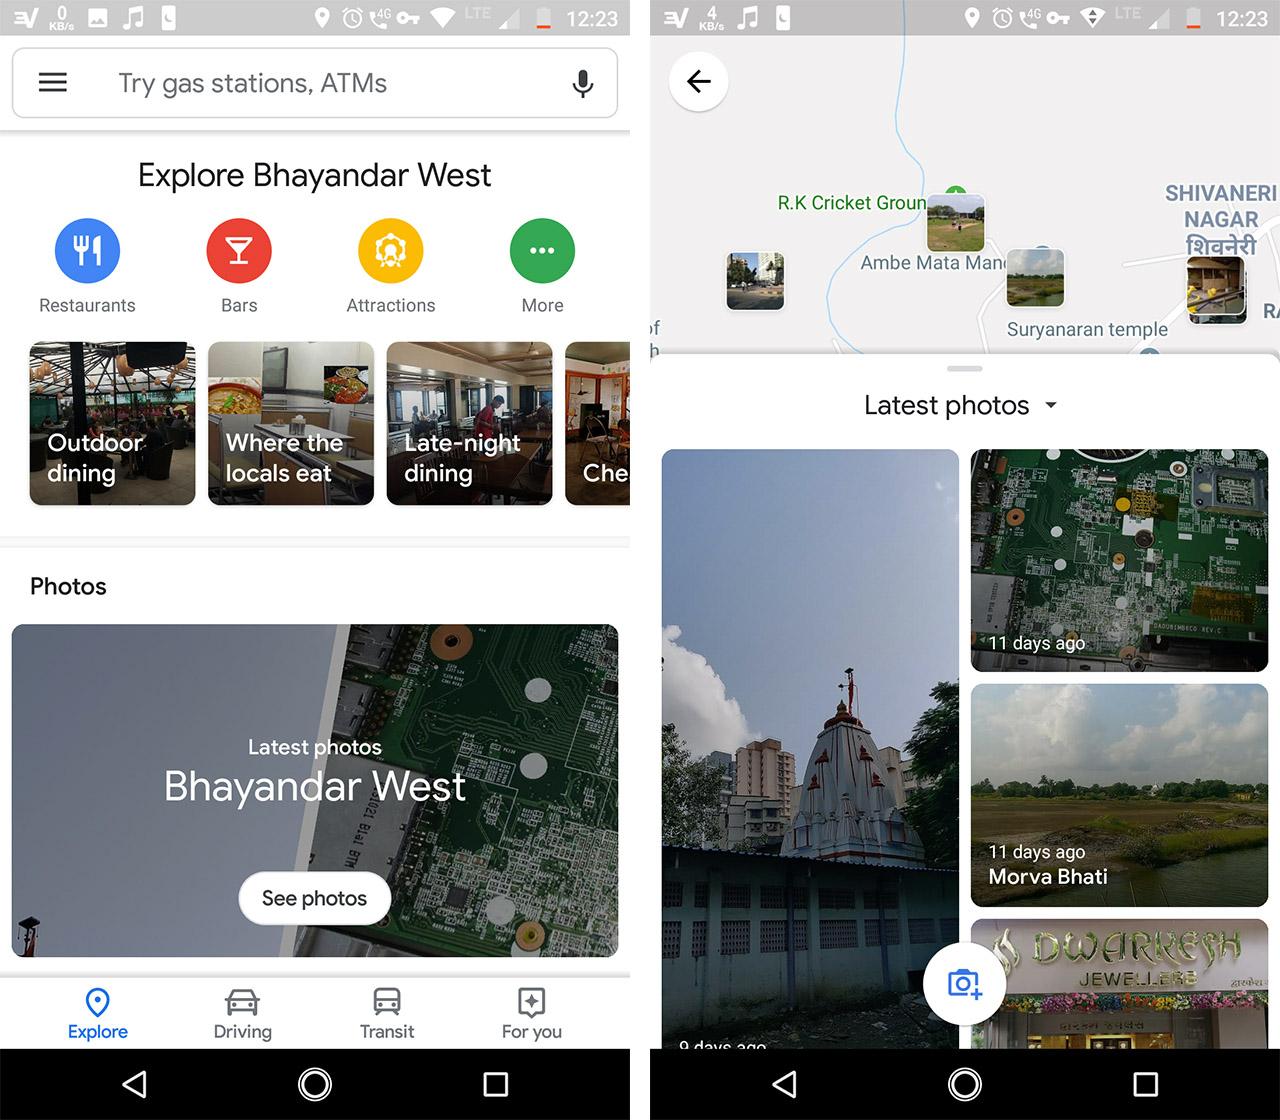 Google Maps Photos section